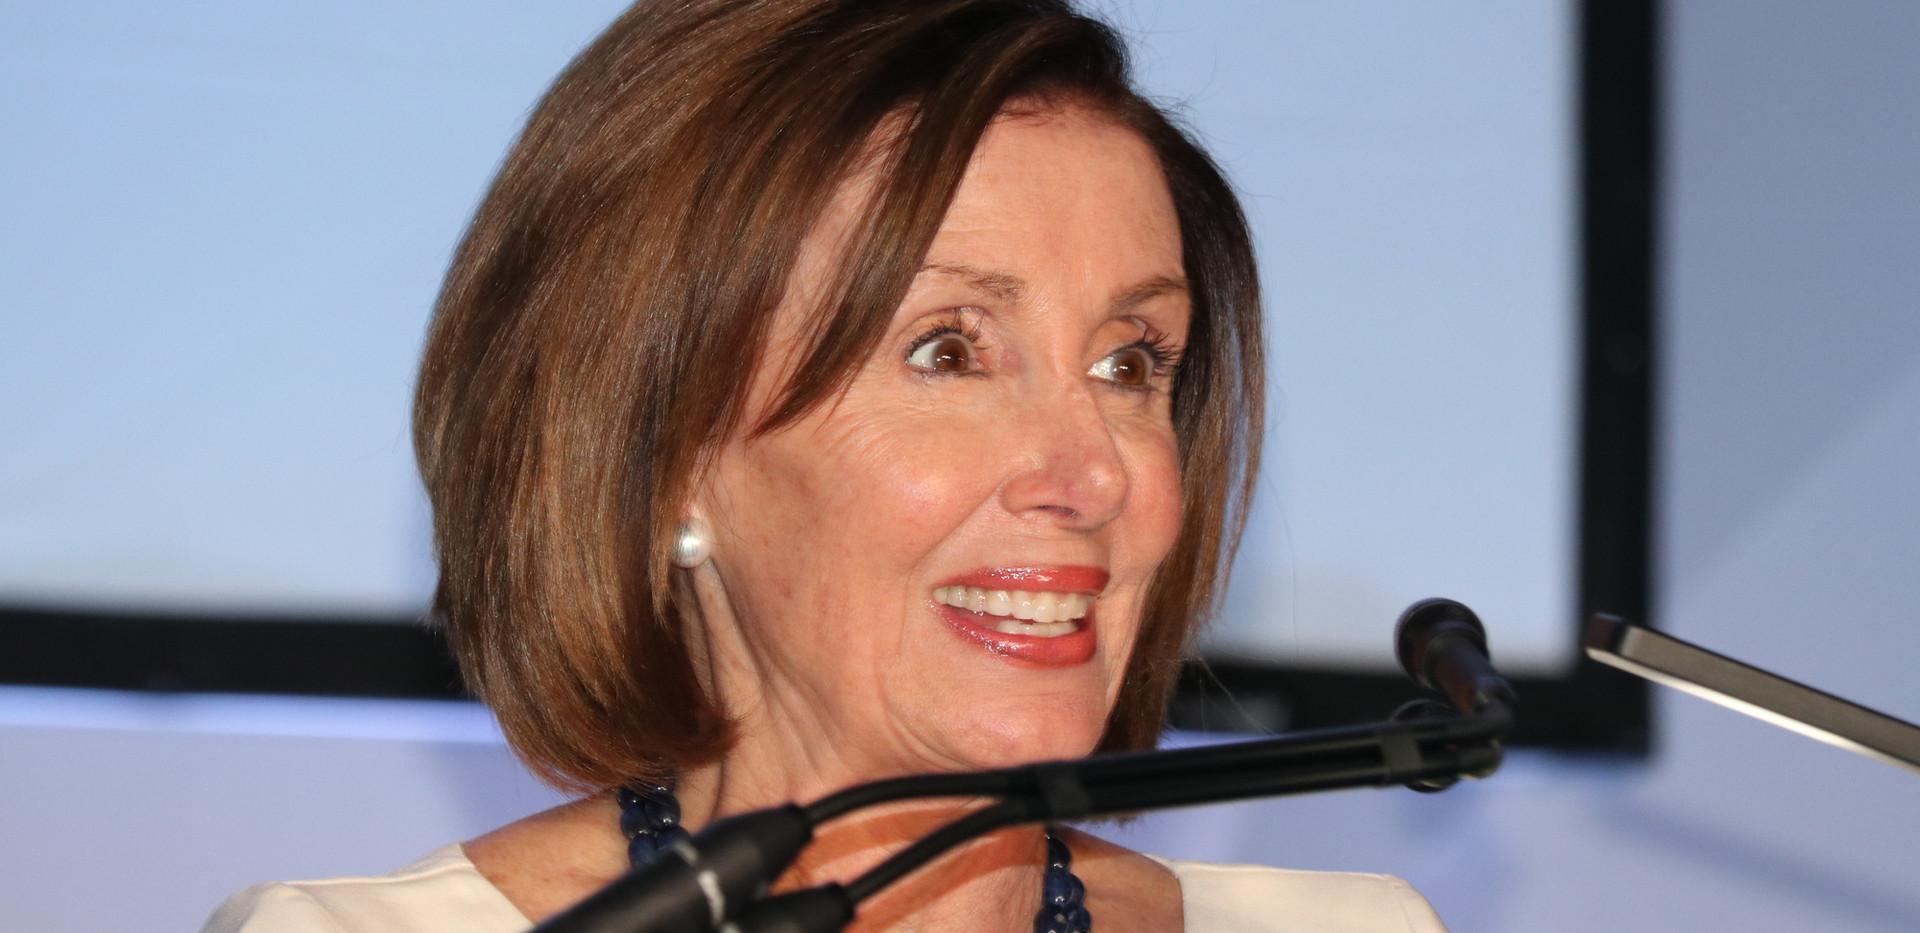 Speaker of the House - Nancy Pelosi